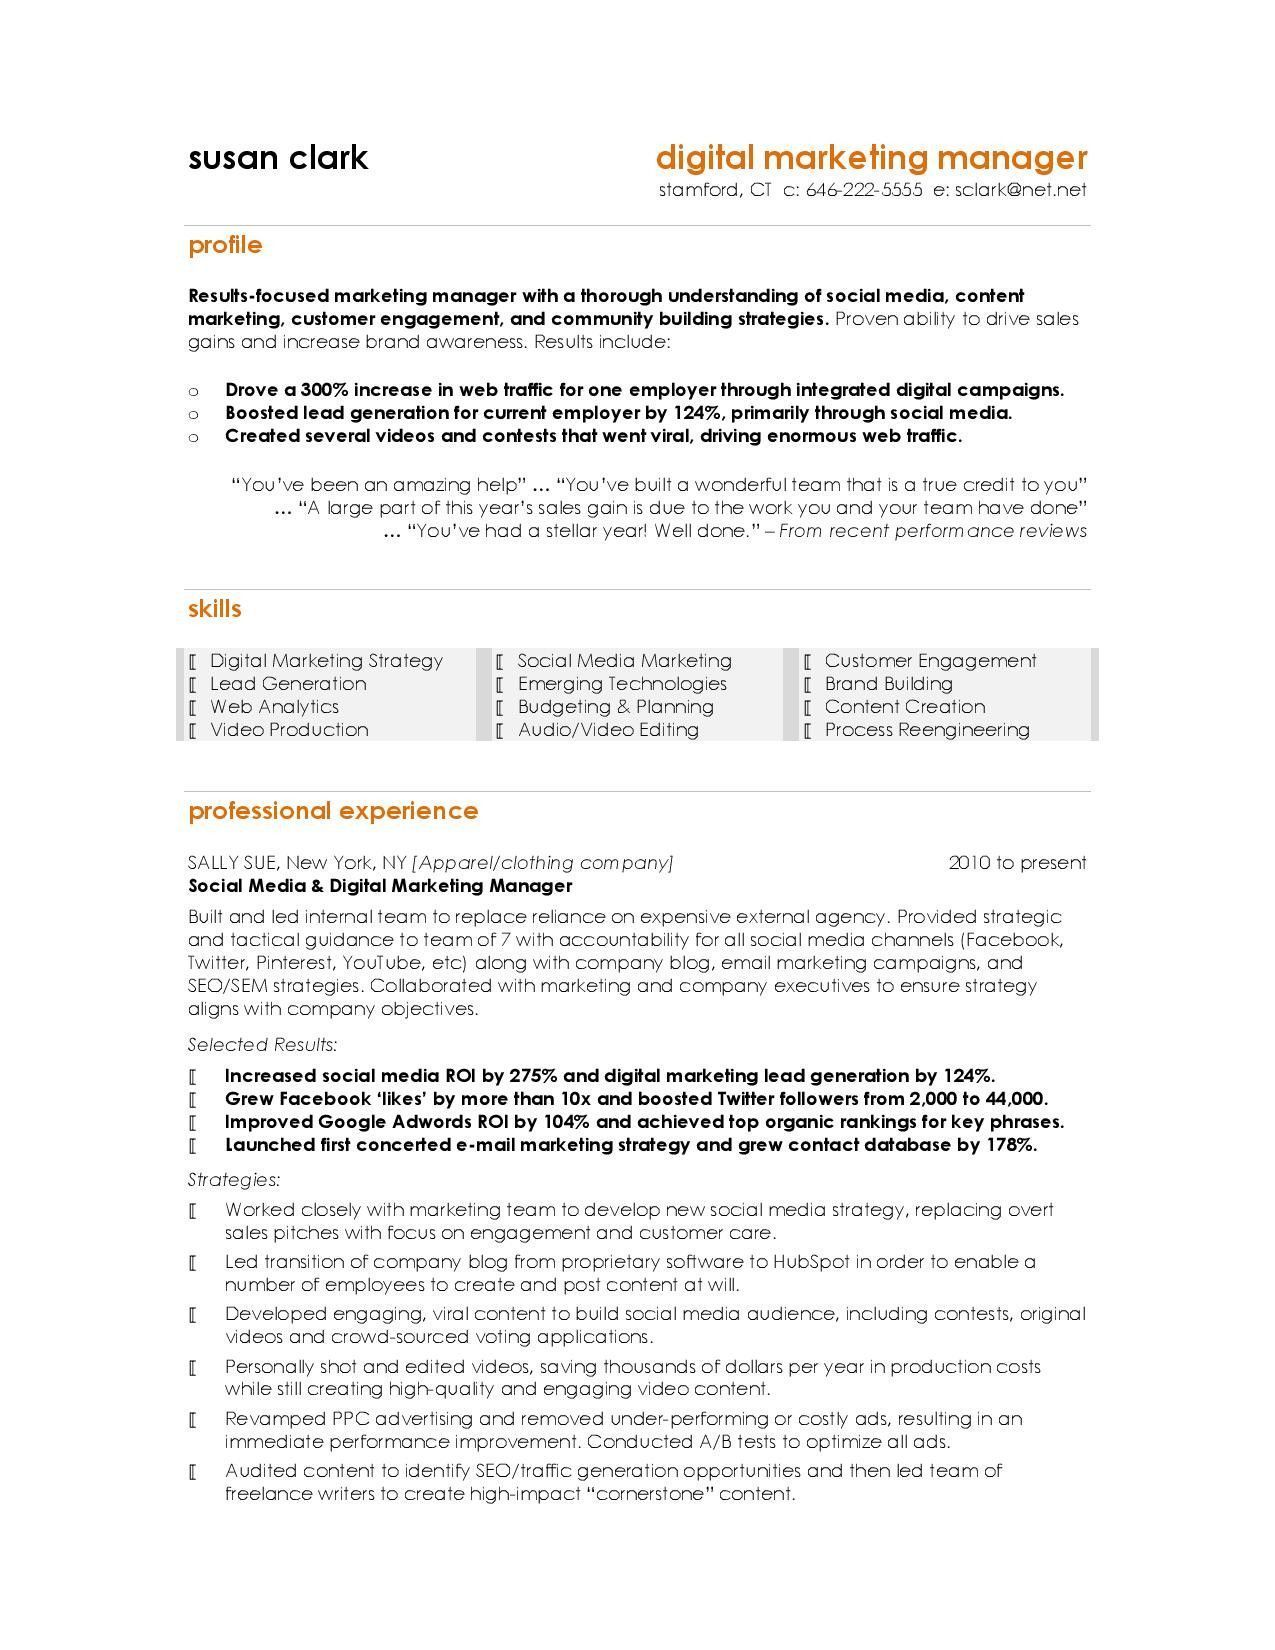 Best Marketing Resumes 4244 Marketing Resume Digital Marketing Manager Digital Marketing